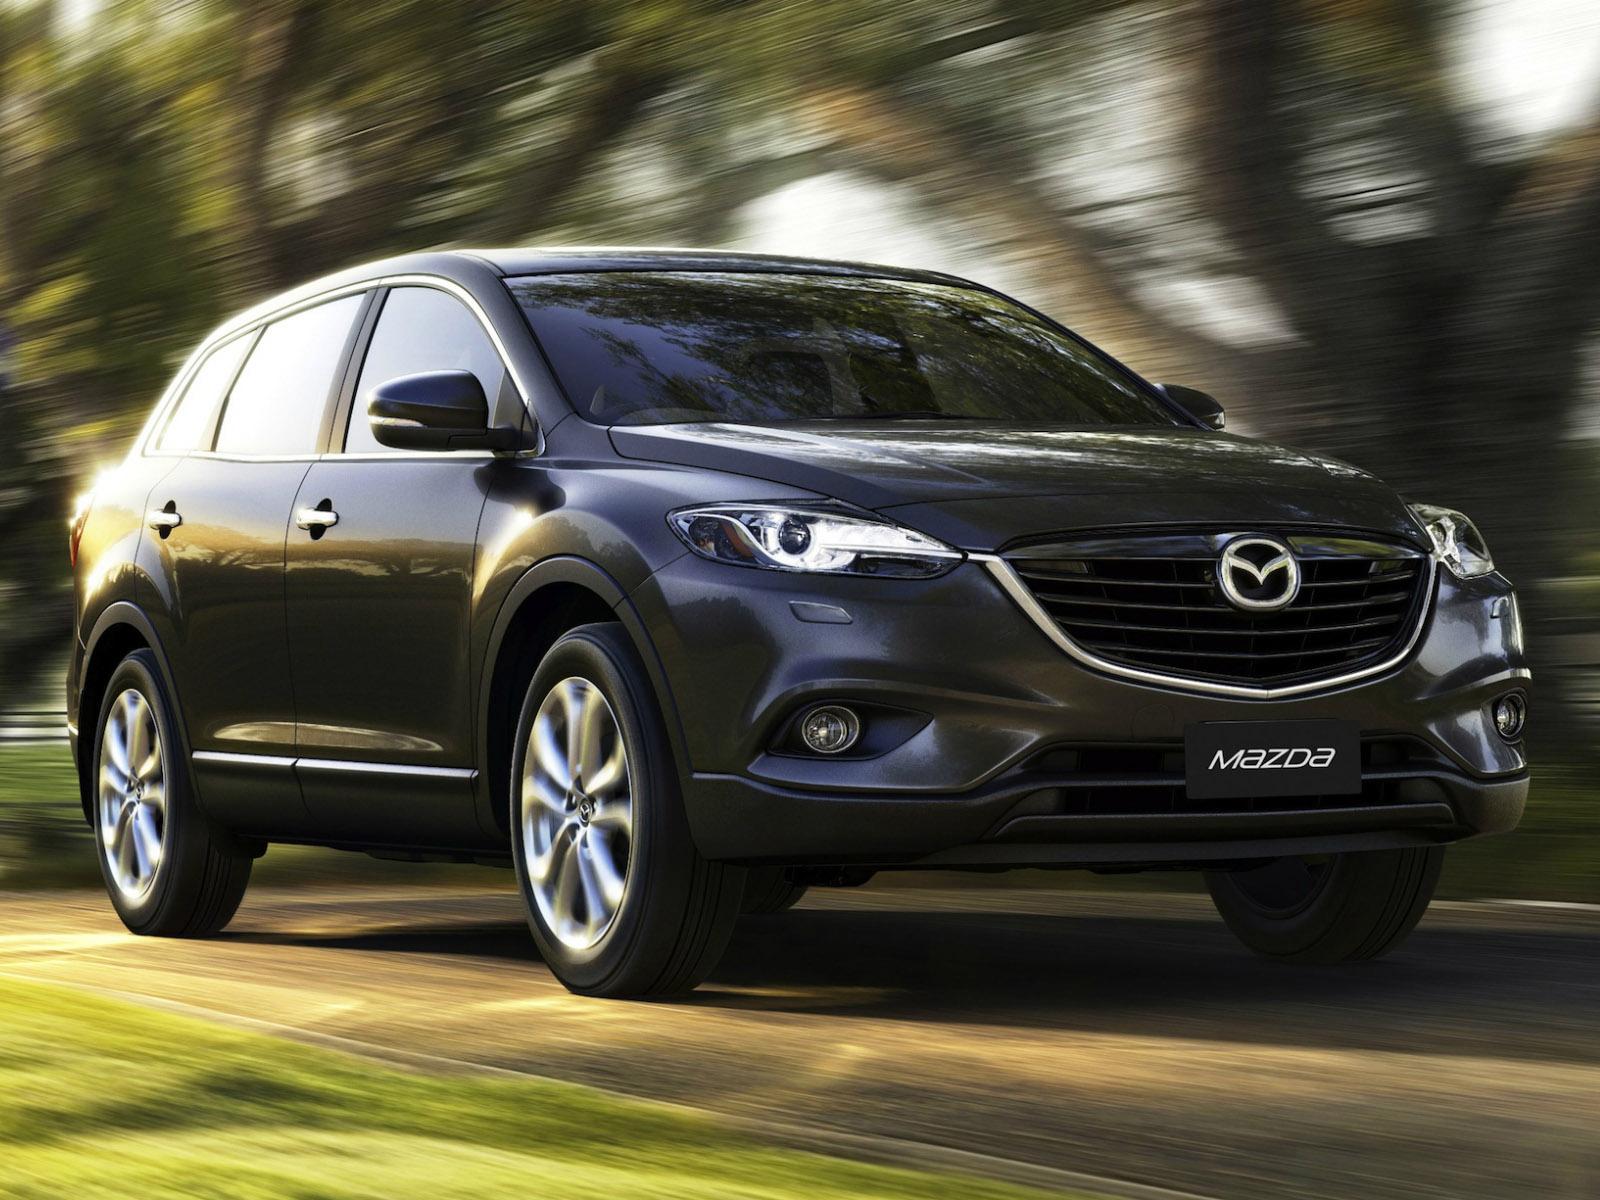 Mazda CX-9 photo #2